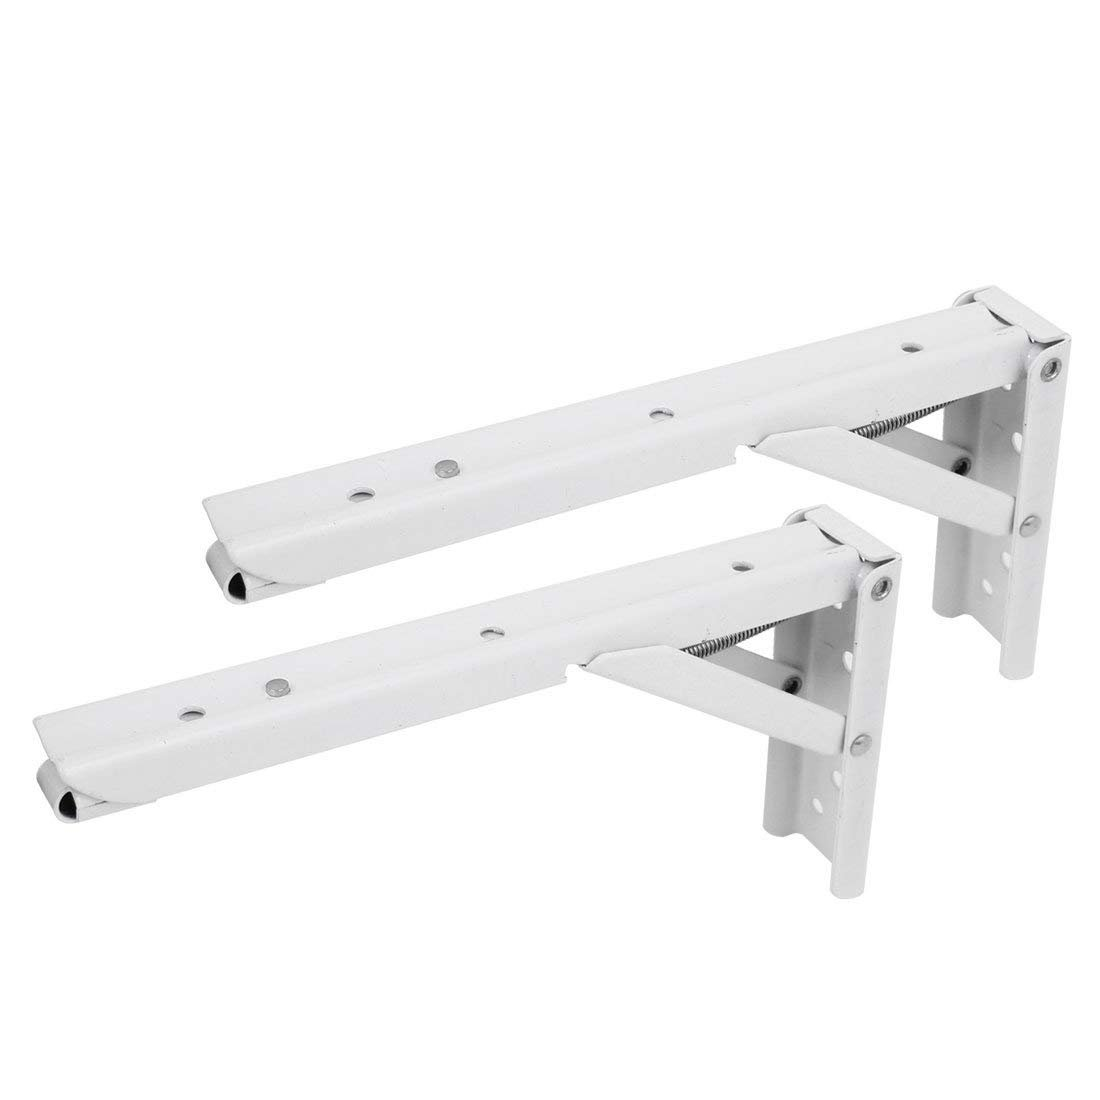 8 L Shaped Self Lock Foldable Shelf Bracket Brace Support 2pcs